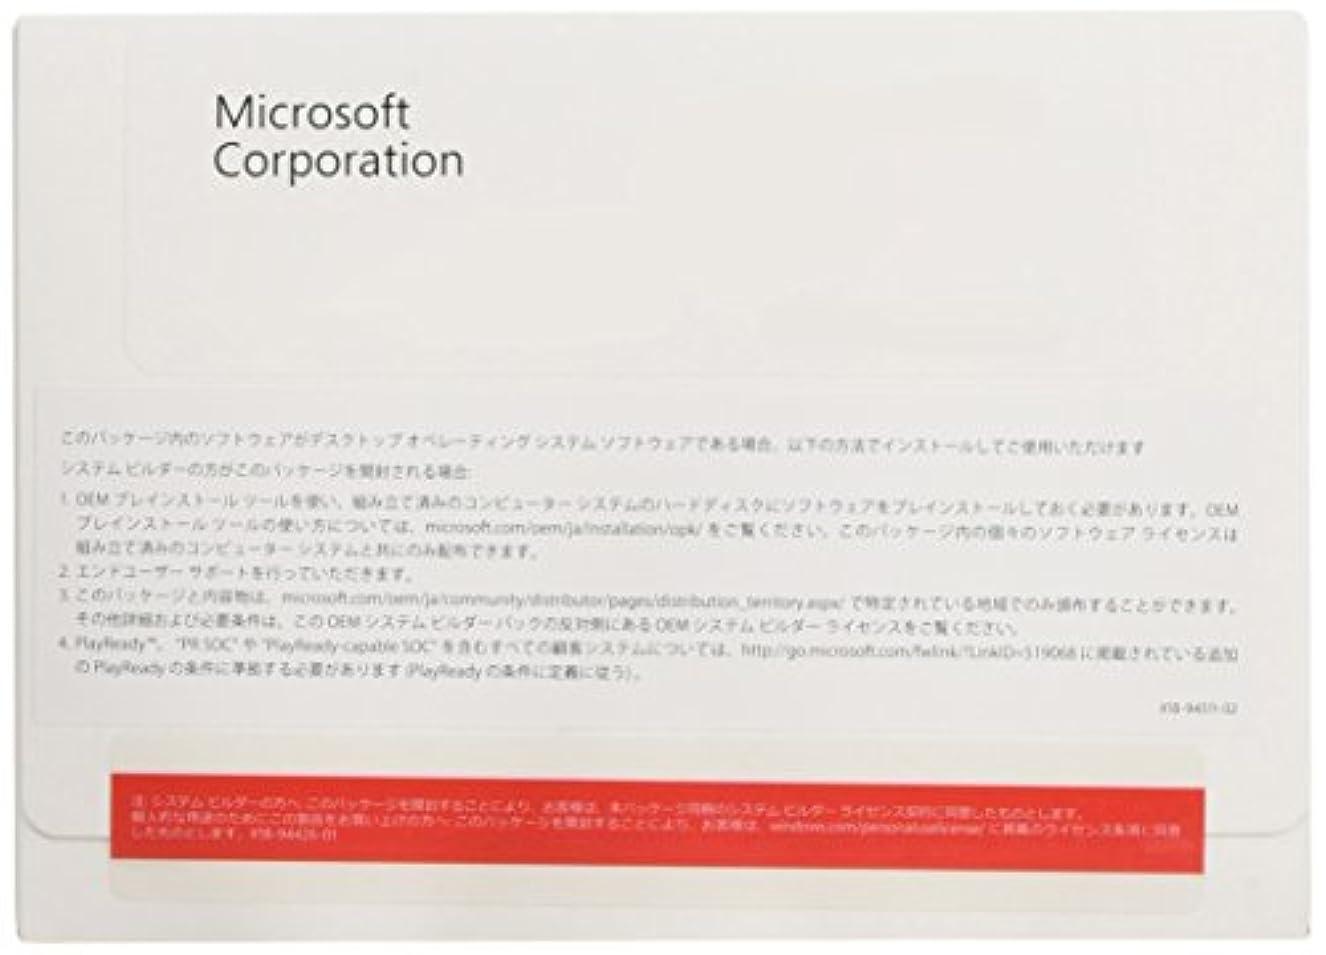 Microsoft Windows10 Home Premium 64bit Creators Update日本語 DSP版 DVD LCP 【紙パッケージ版】+USB増設PCIカードUSB2.0